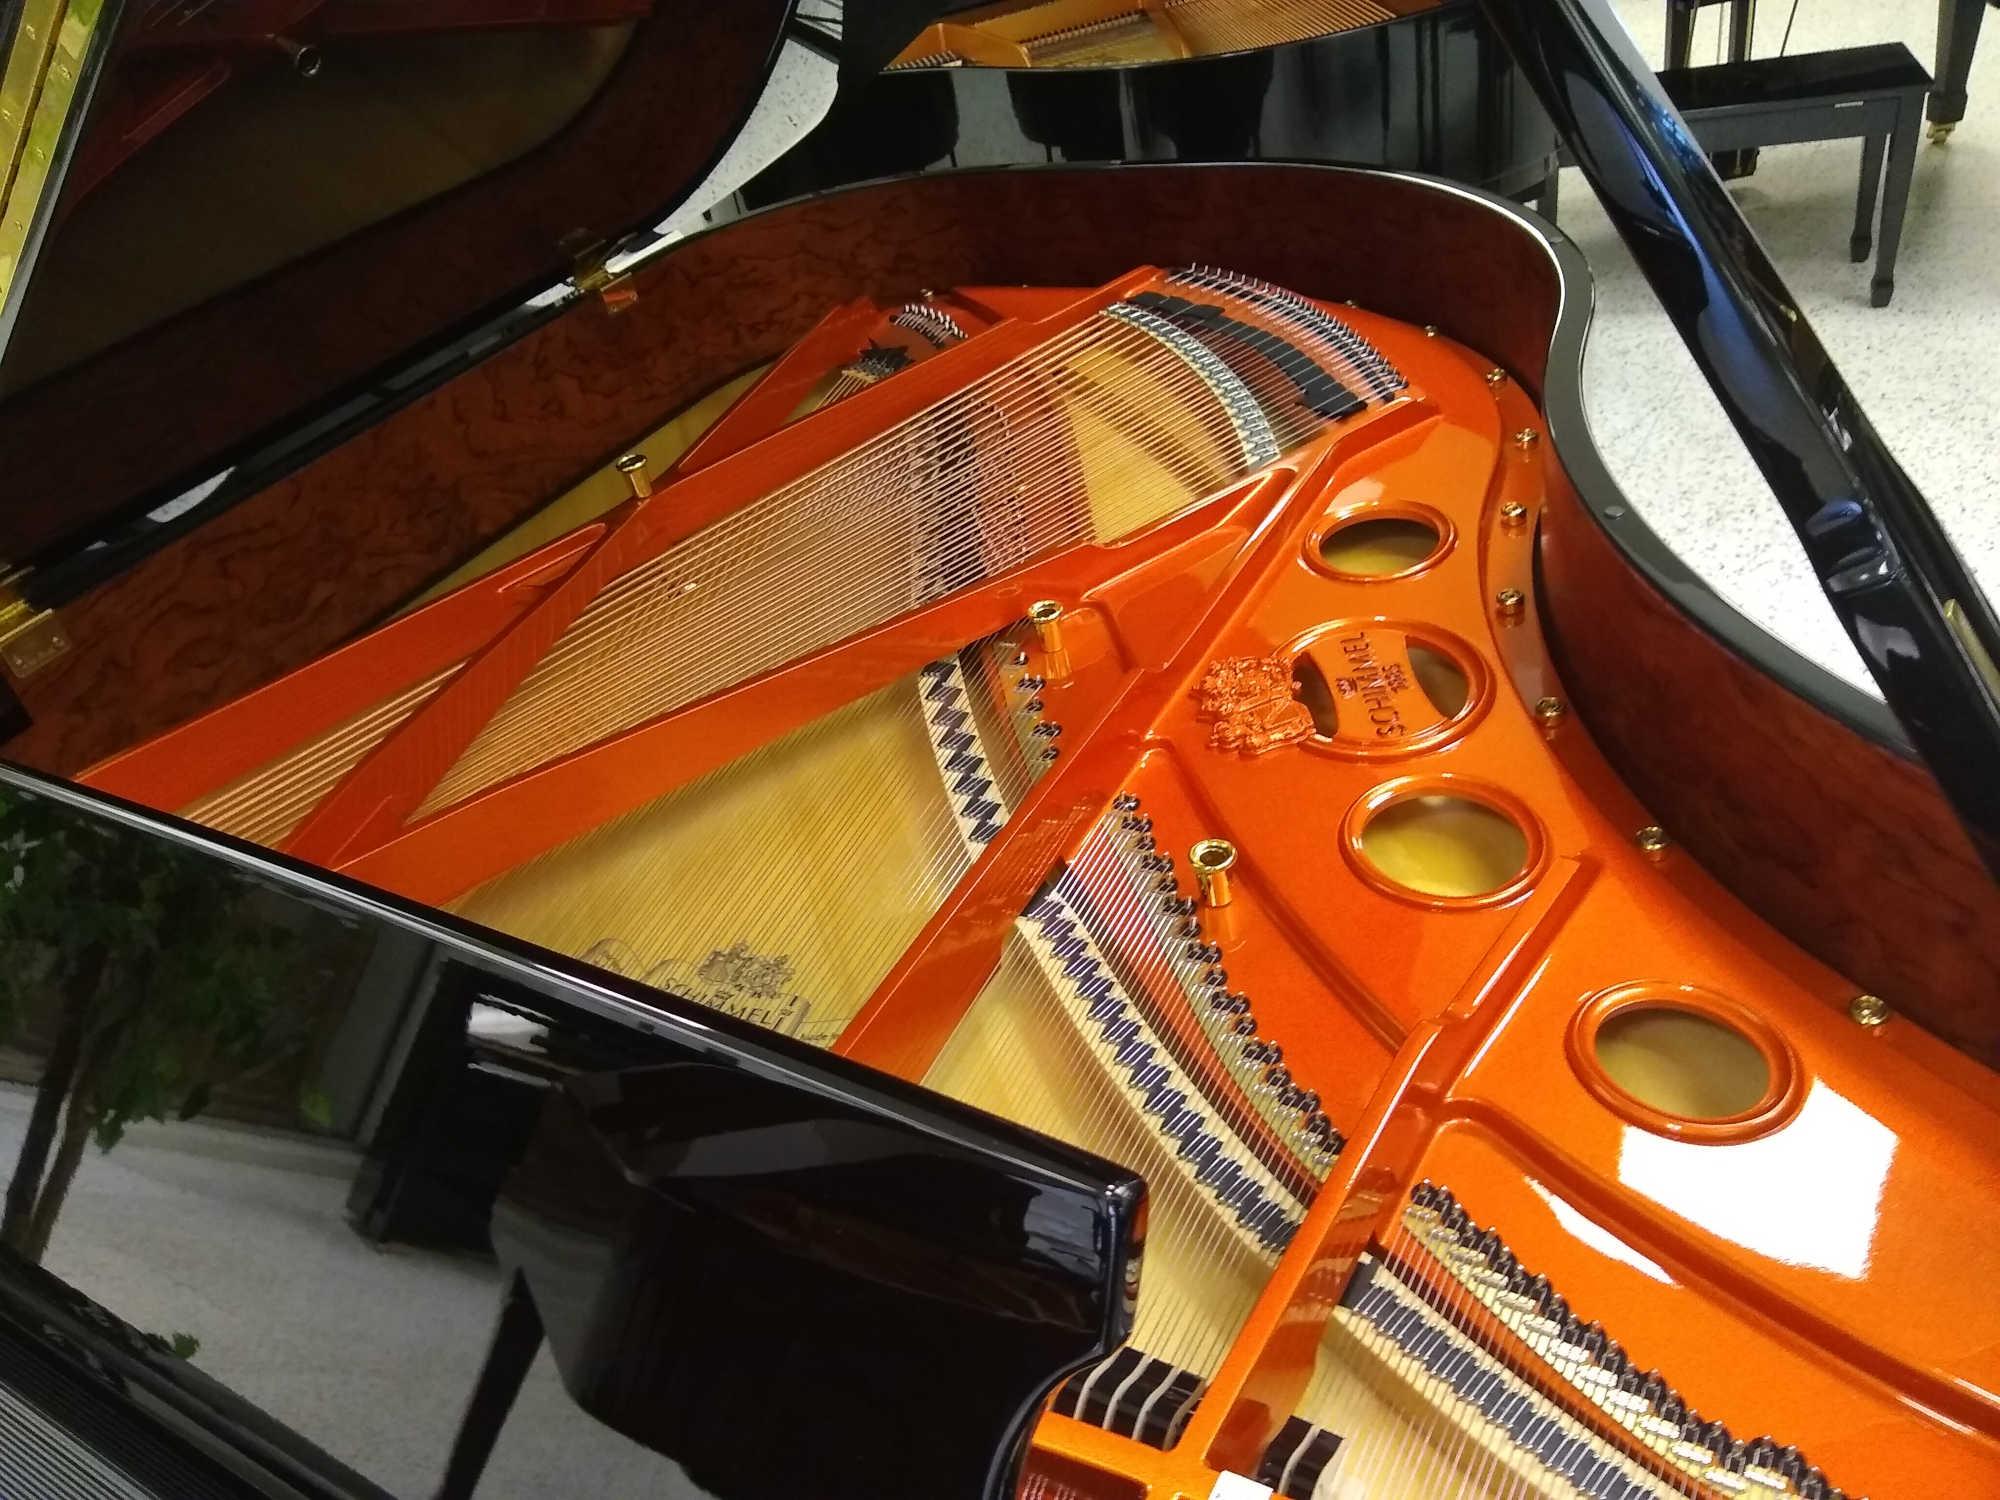 Schimmel C189 Grand Piano